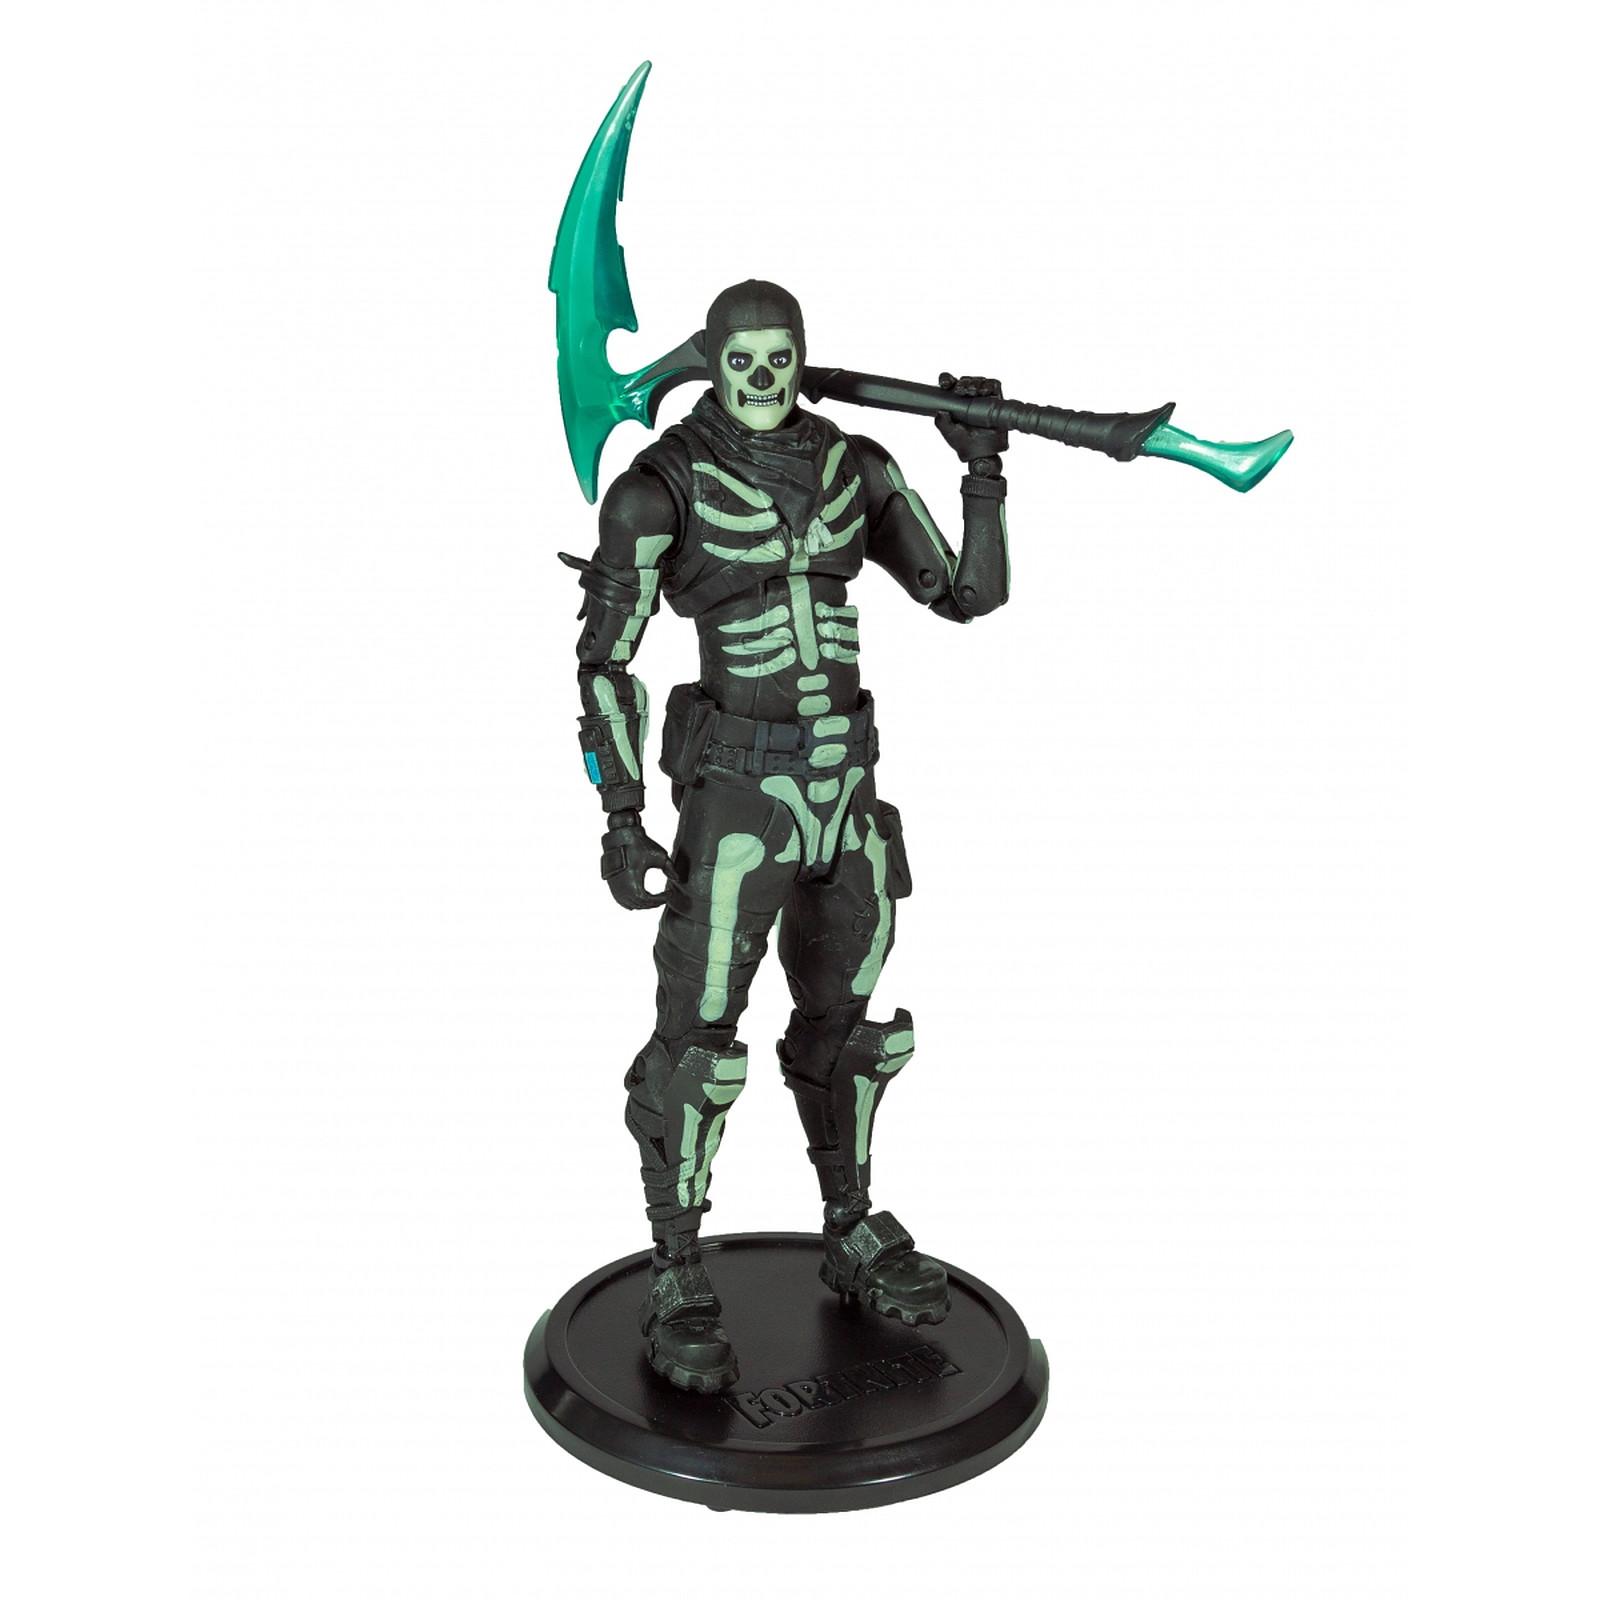 Fortnite - Figurine Green Glow Skull Trooper (Glow-in-the-Dark) Walgreens Exclusive 18 cm